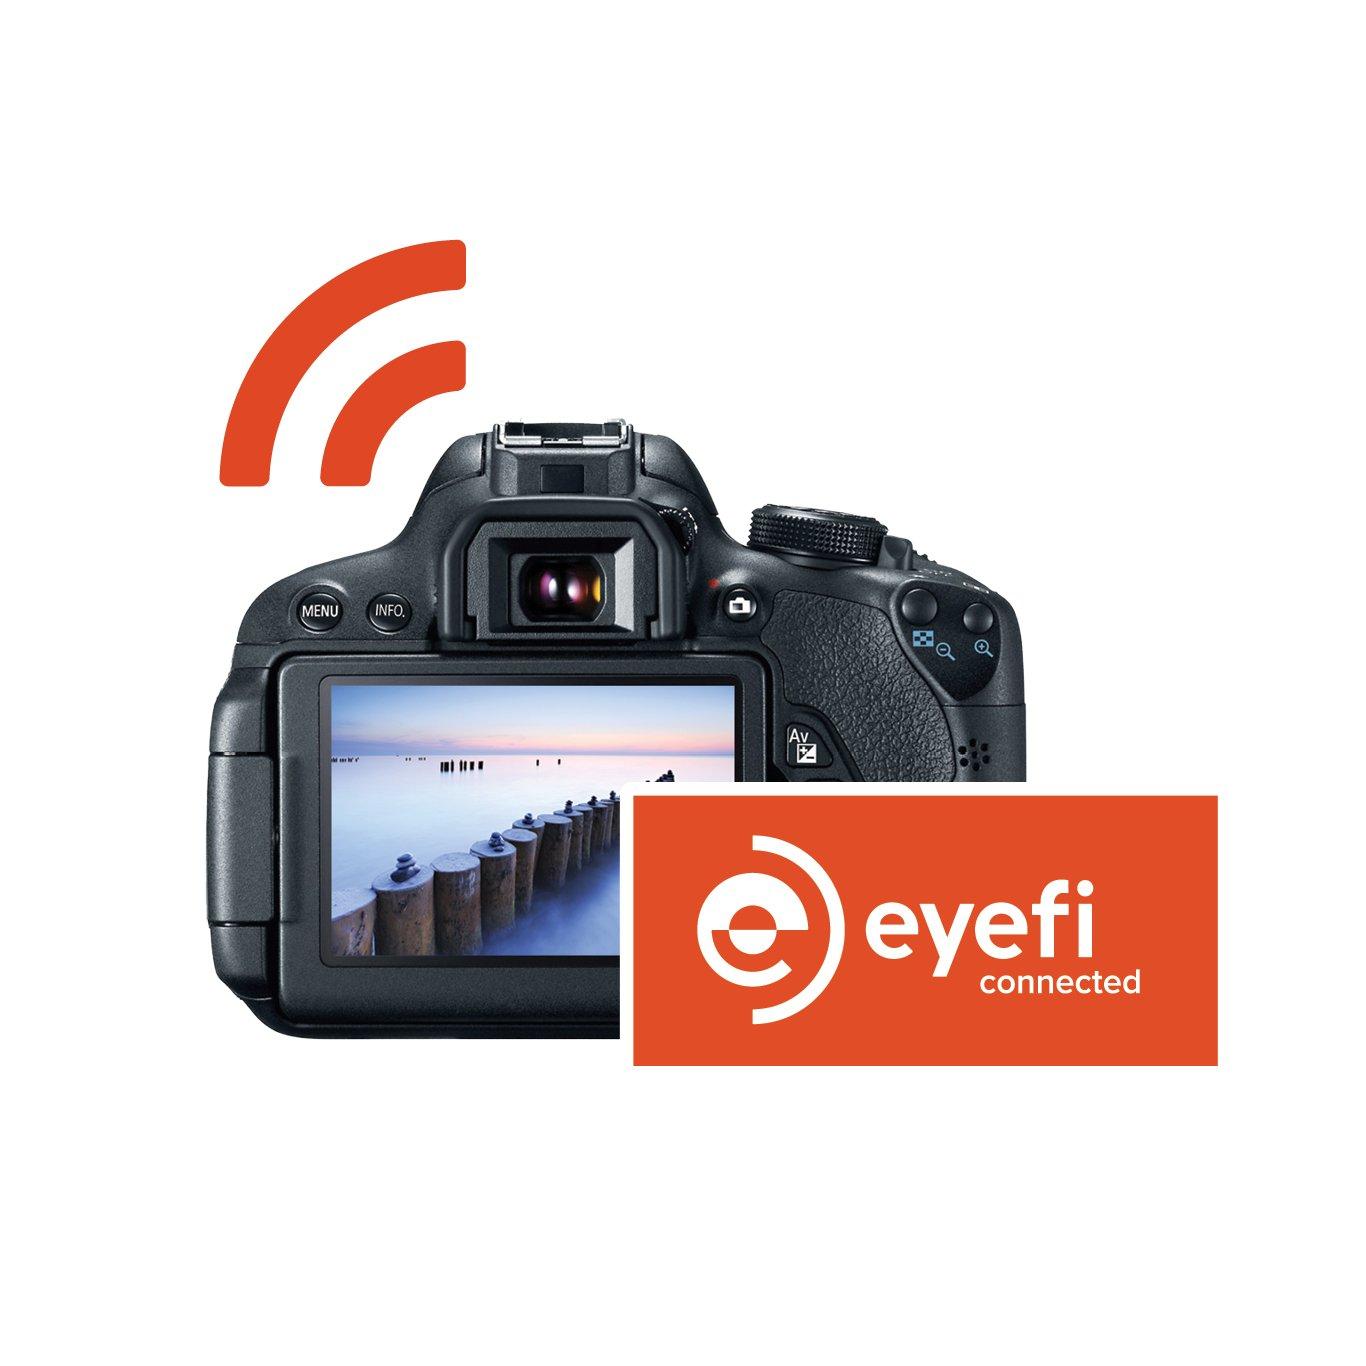 Amazon Eyefi Mobi 8gb Class 10 Wi Fi Sdhc Card With 90 Day